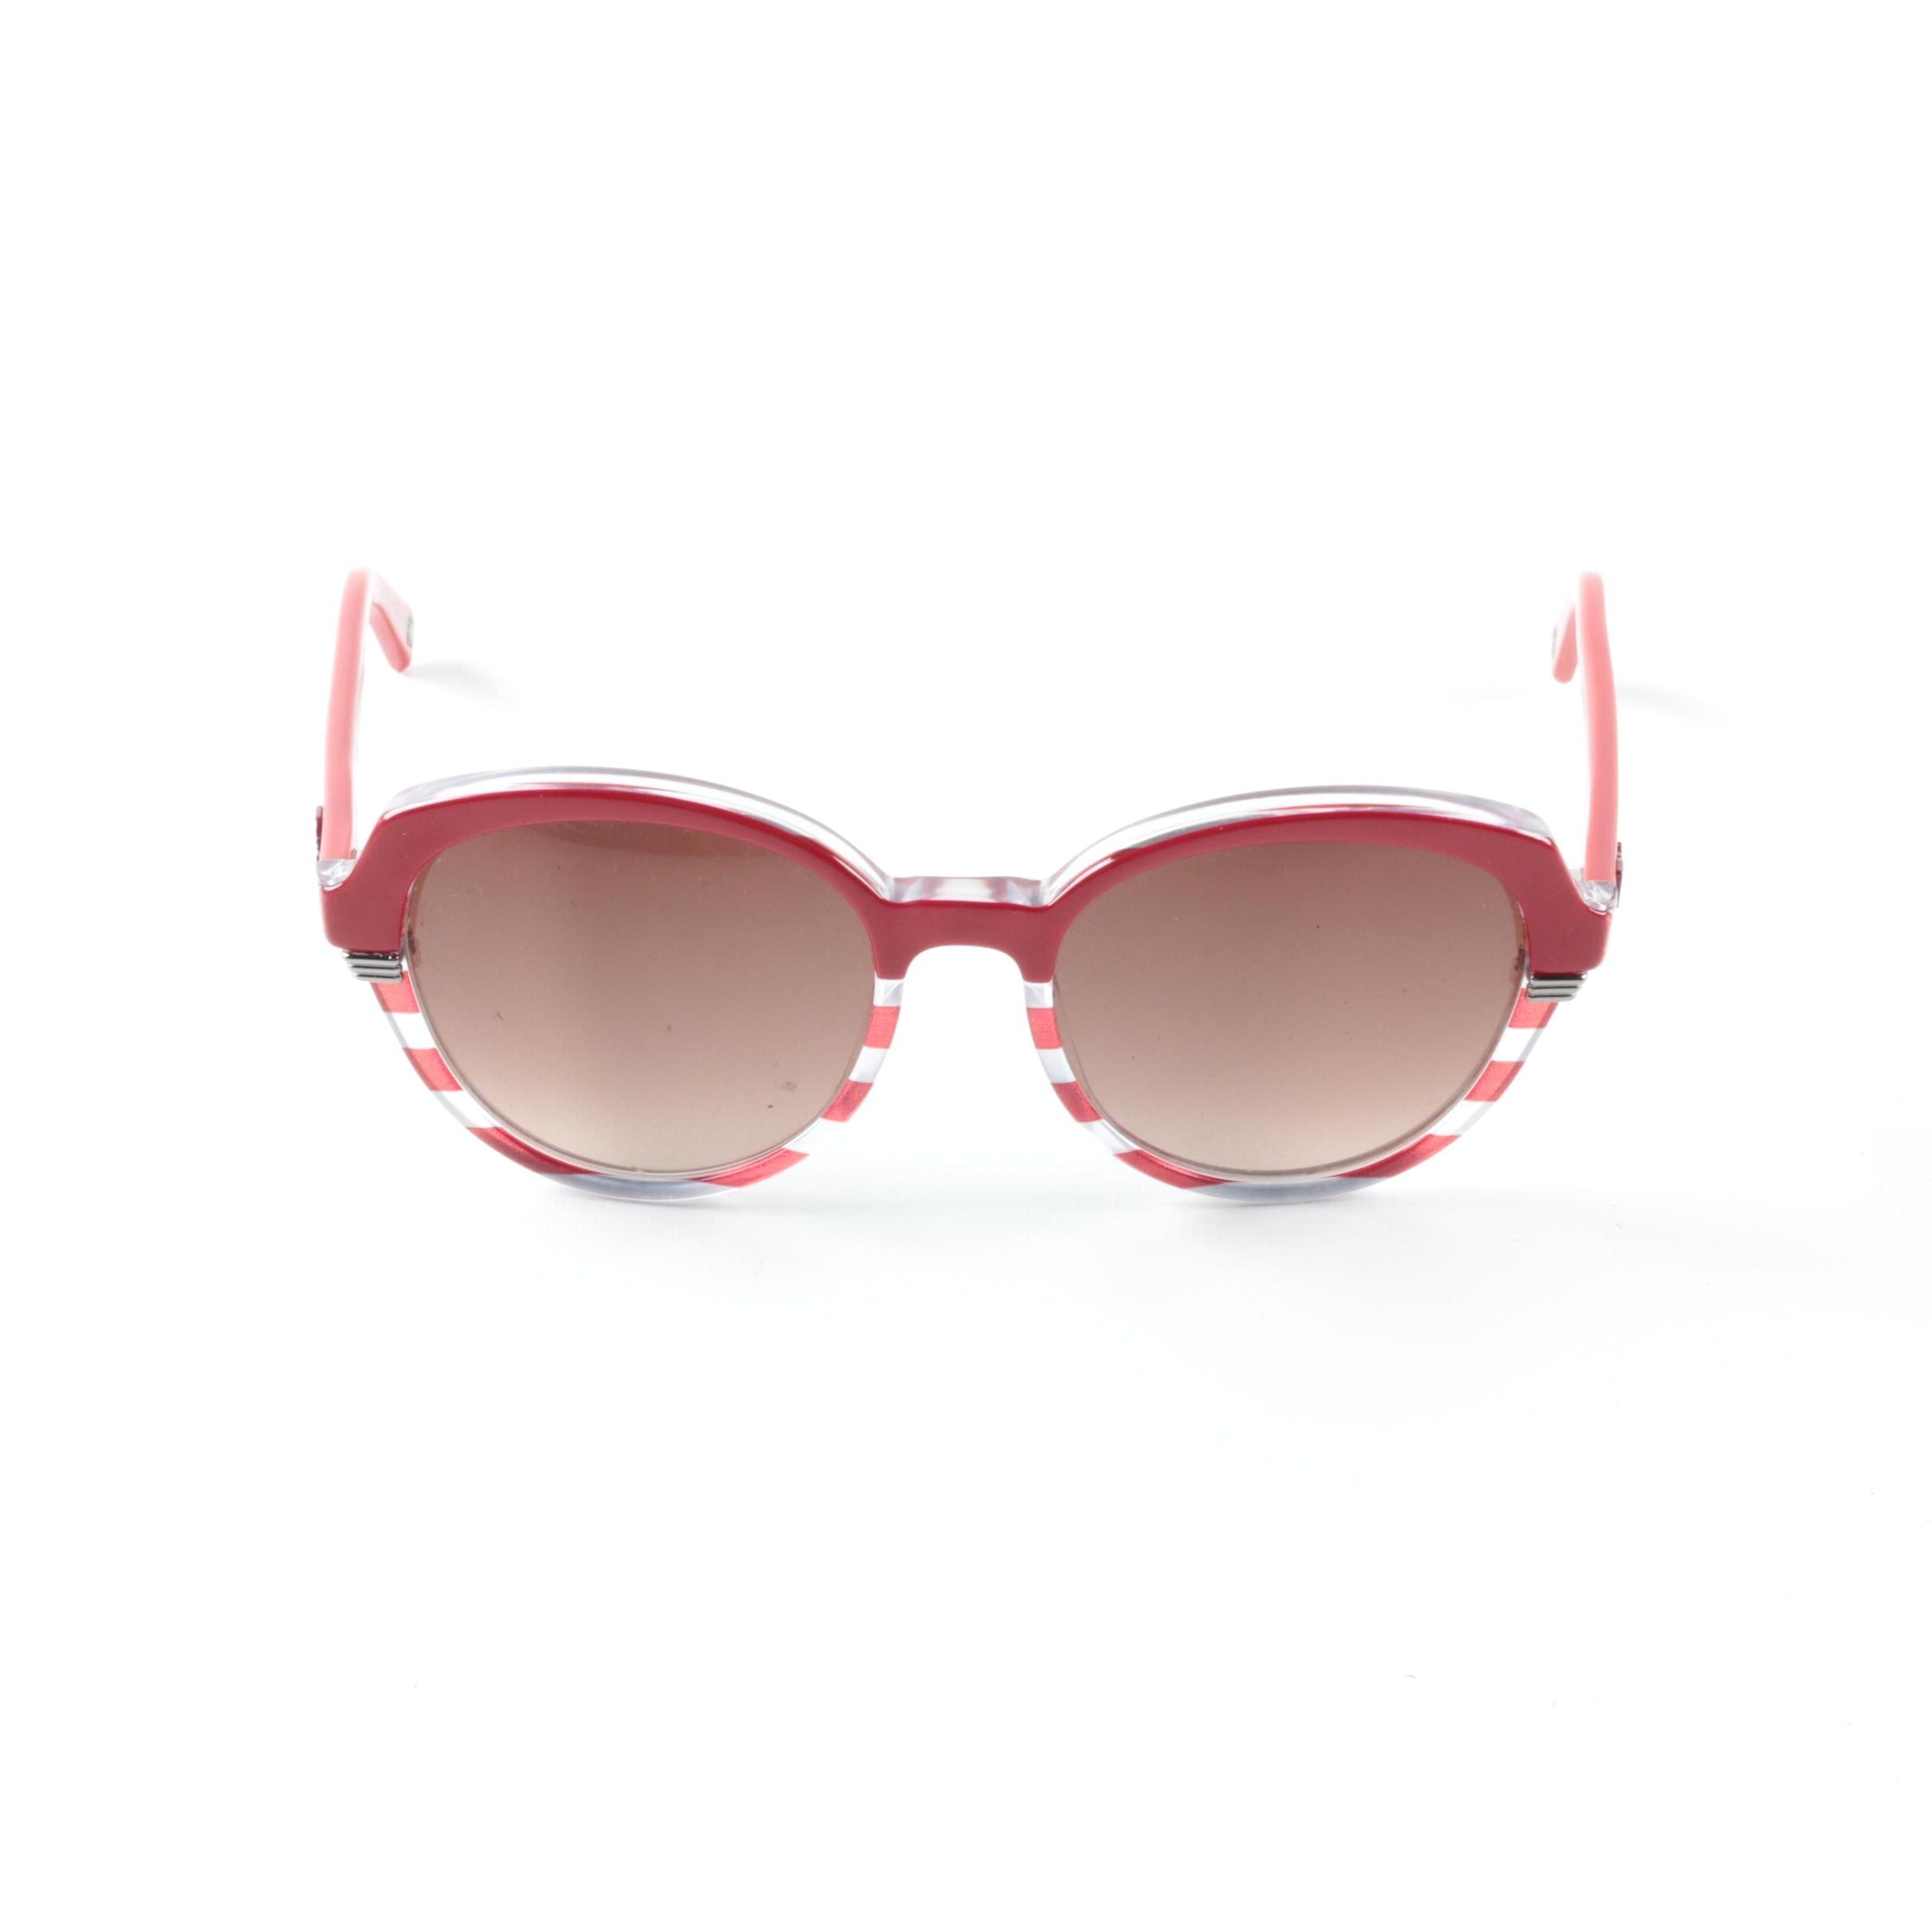 Christian Dior Croisette Sunglasses